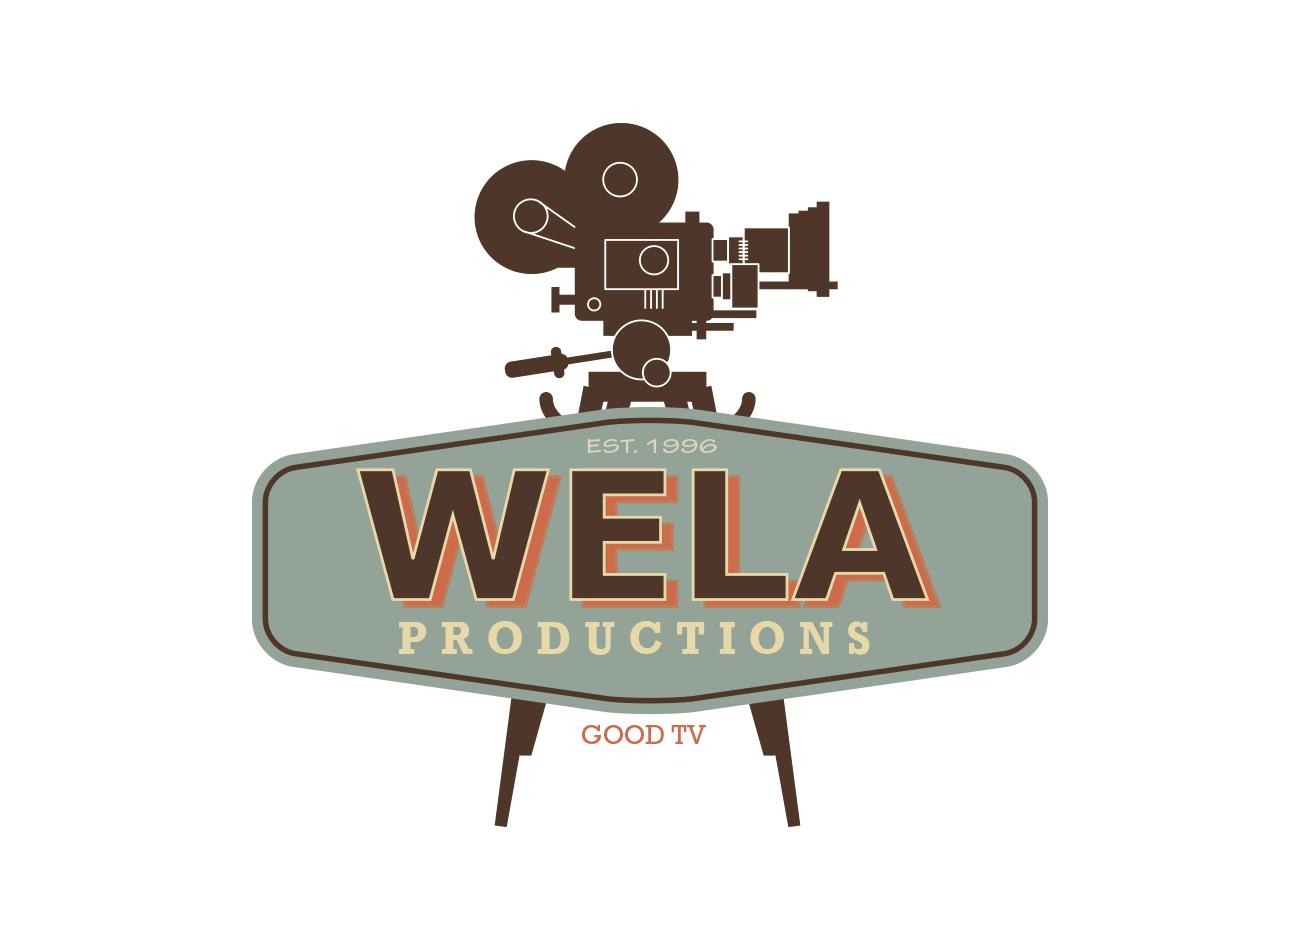 wela-productions-company-logo-by-agent-orange-design-south-africa-johannesburg.jpg